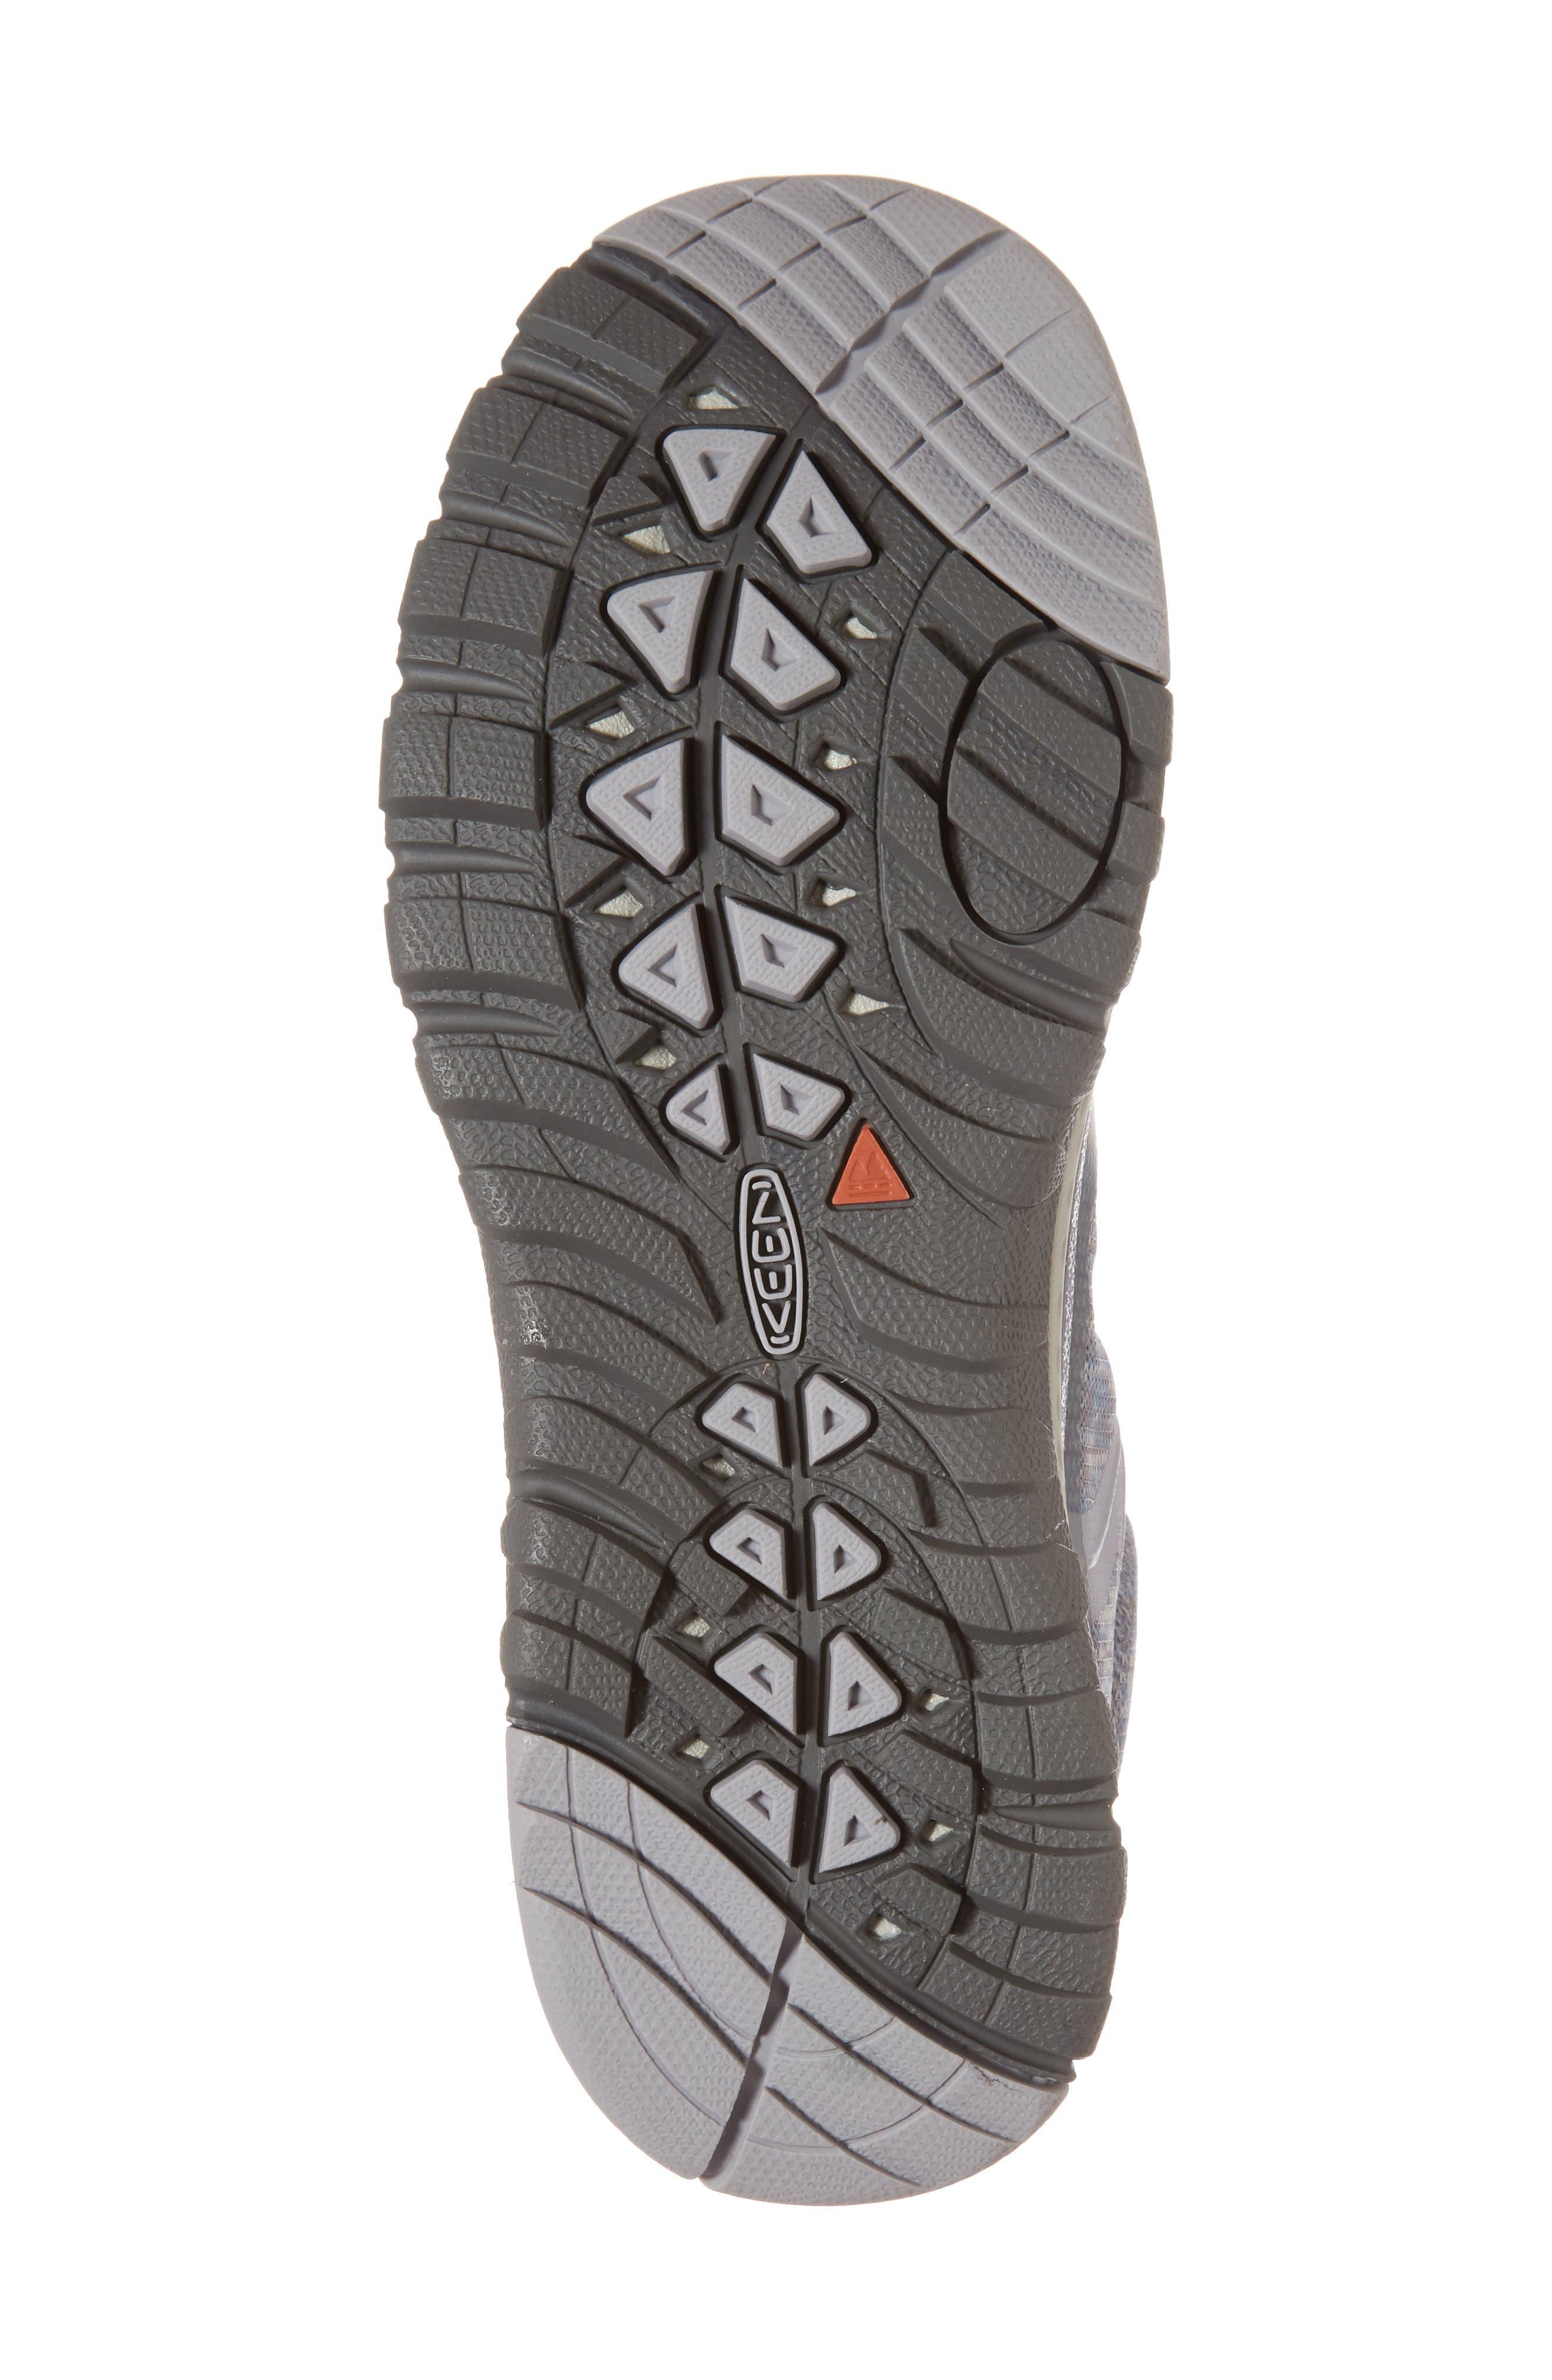 Terradora Waterproof Hiking Boot,                             Alternate thumbnail 6, color,                             DAPPLE GREY/ VAPOR